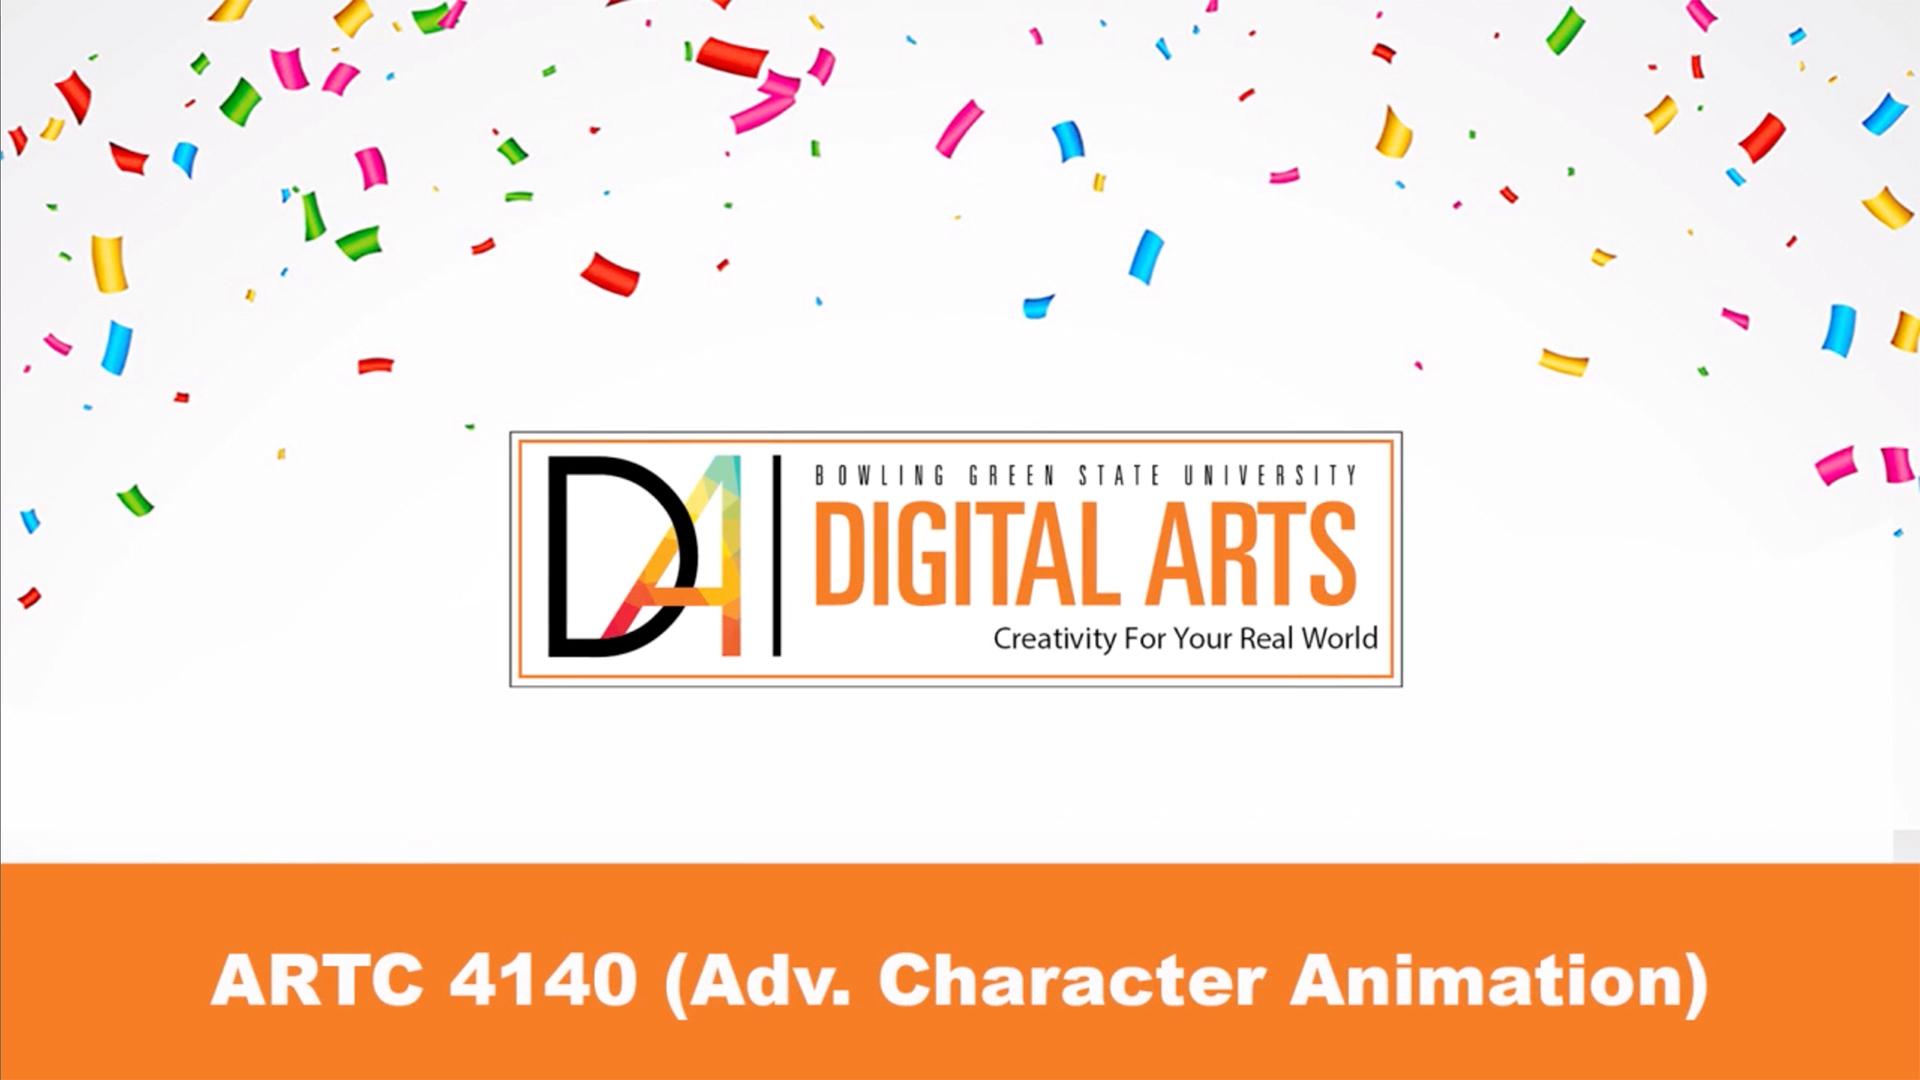 ARTC 4140, Character Animation